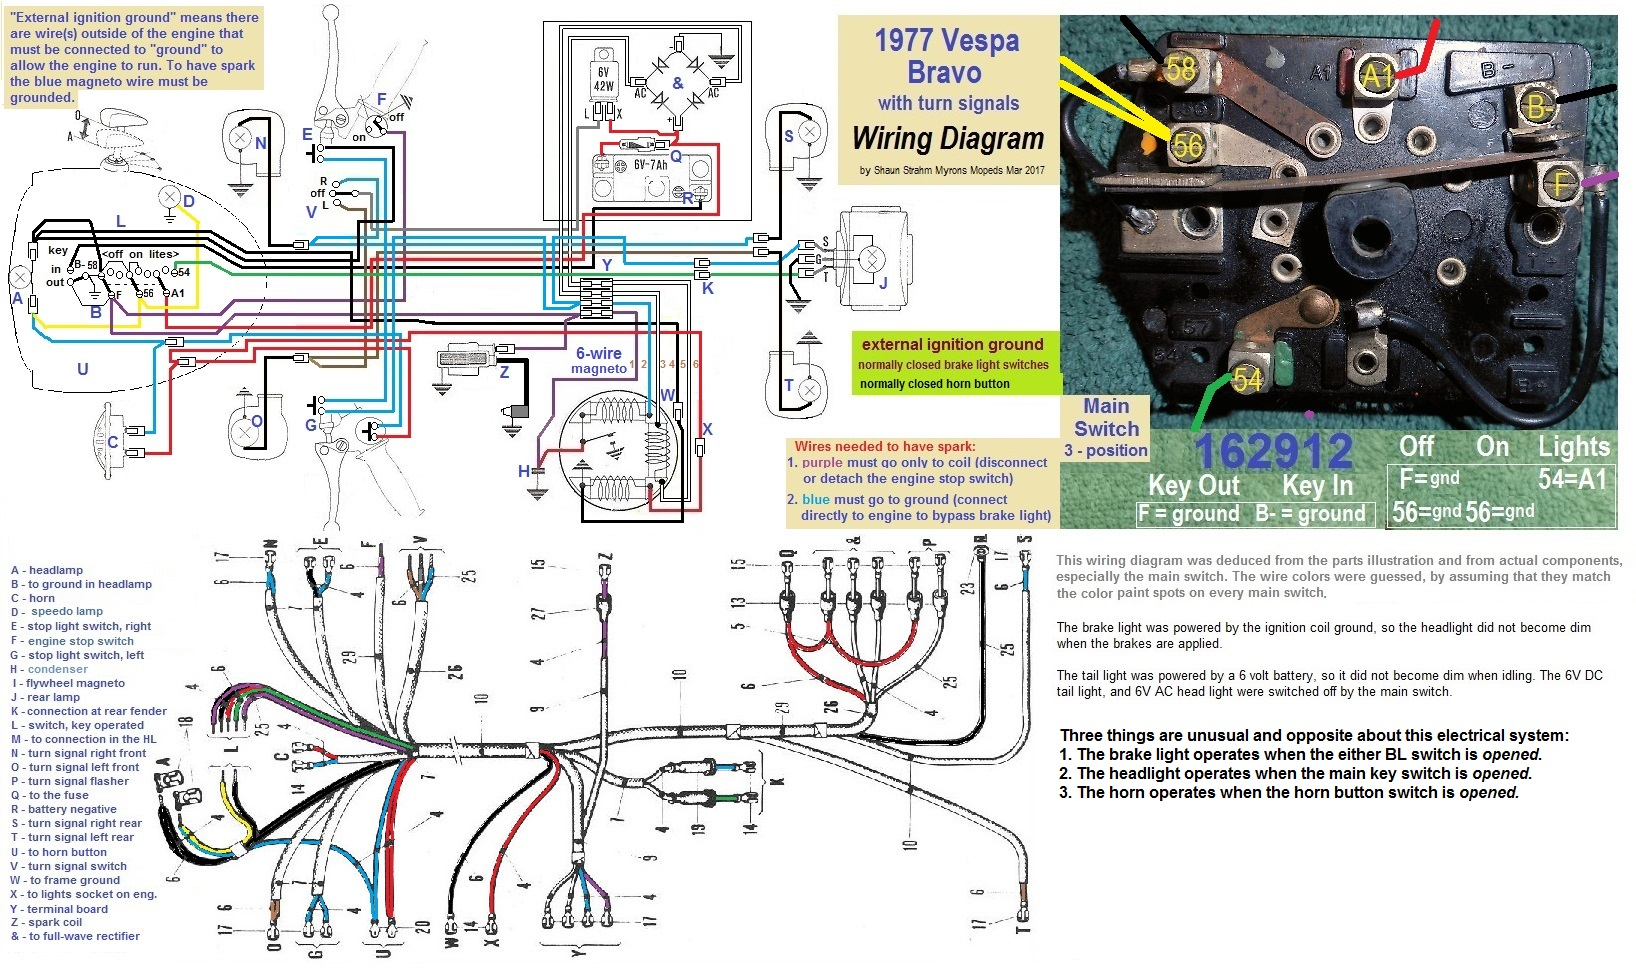 Vespa Allstate Wiring Diagram : Vespa gt wiring diagram ignition